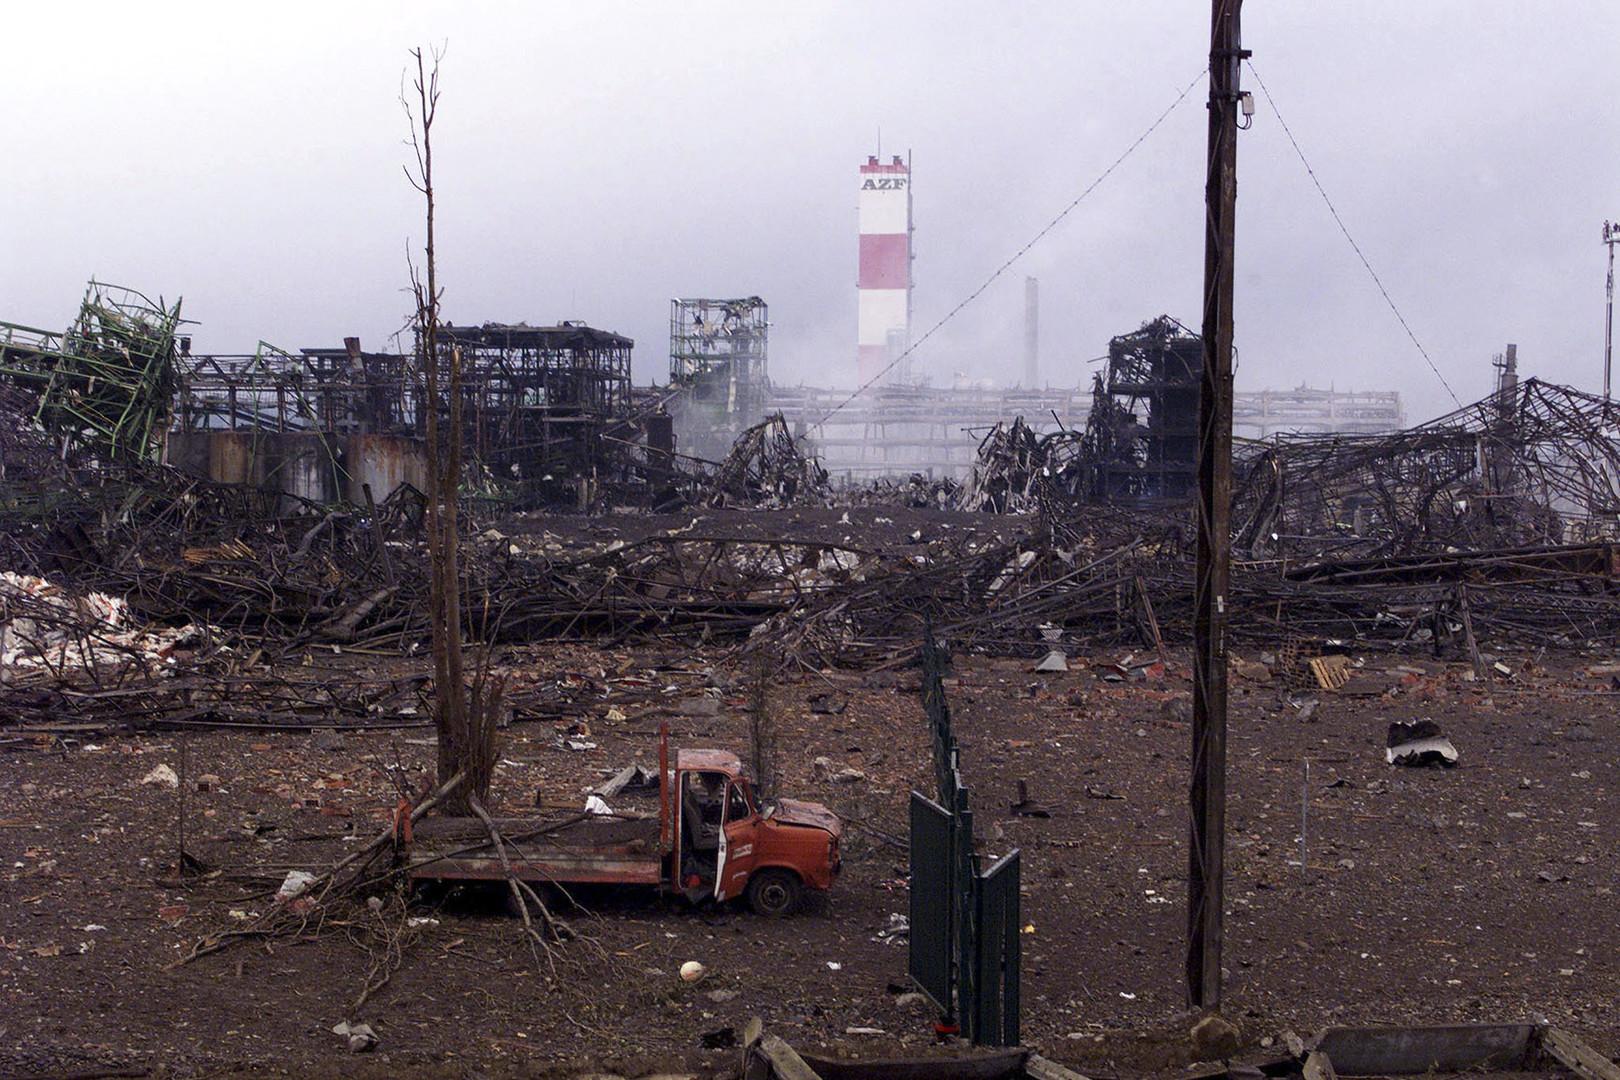 Avant Tianjin, les cinq catastrophes industrielles les plus marquantes de l'histoire (VIDEOS)